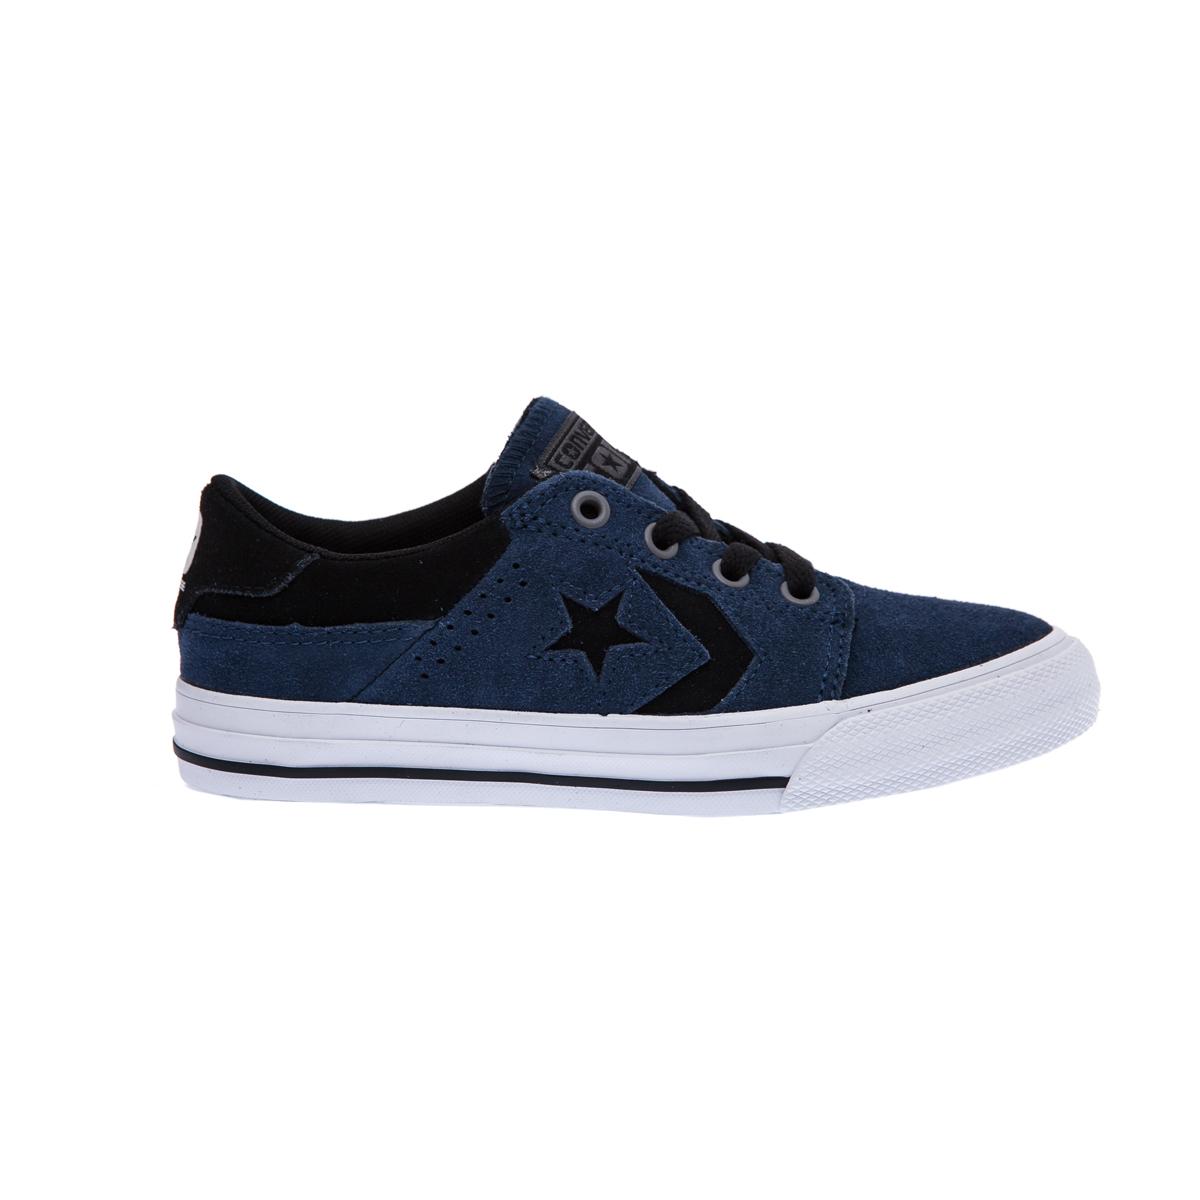 CONVERSE – Παιδικά παπούτσια CONS Tre Star Ox μπλε